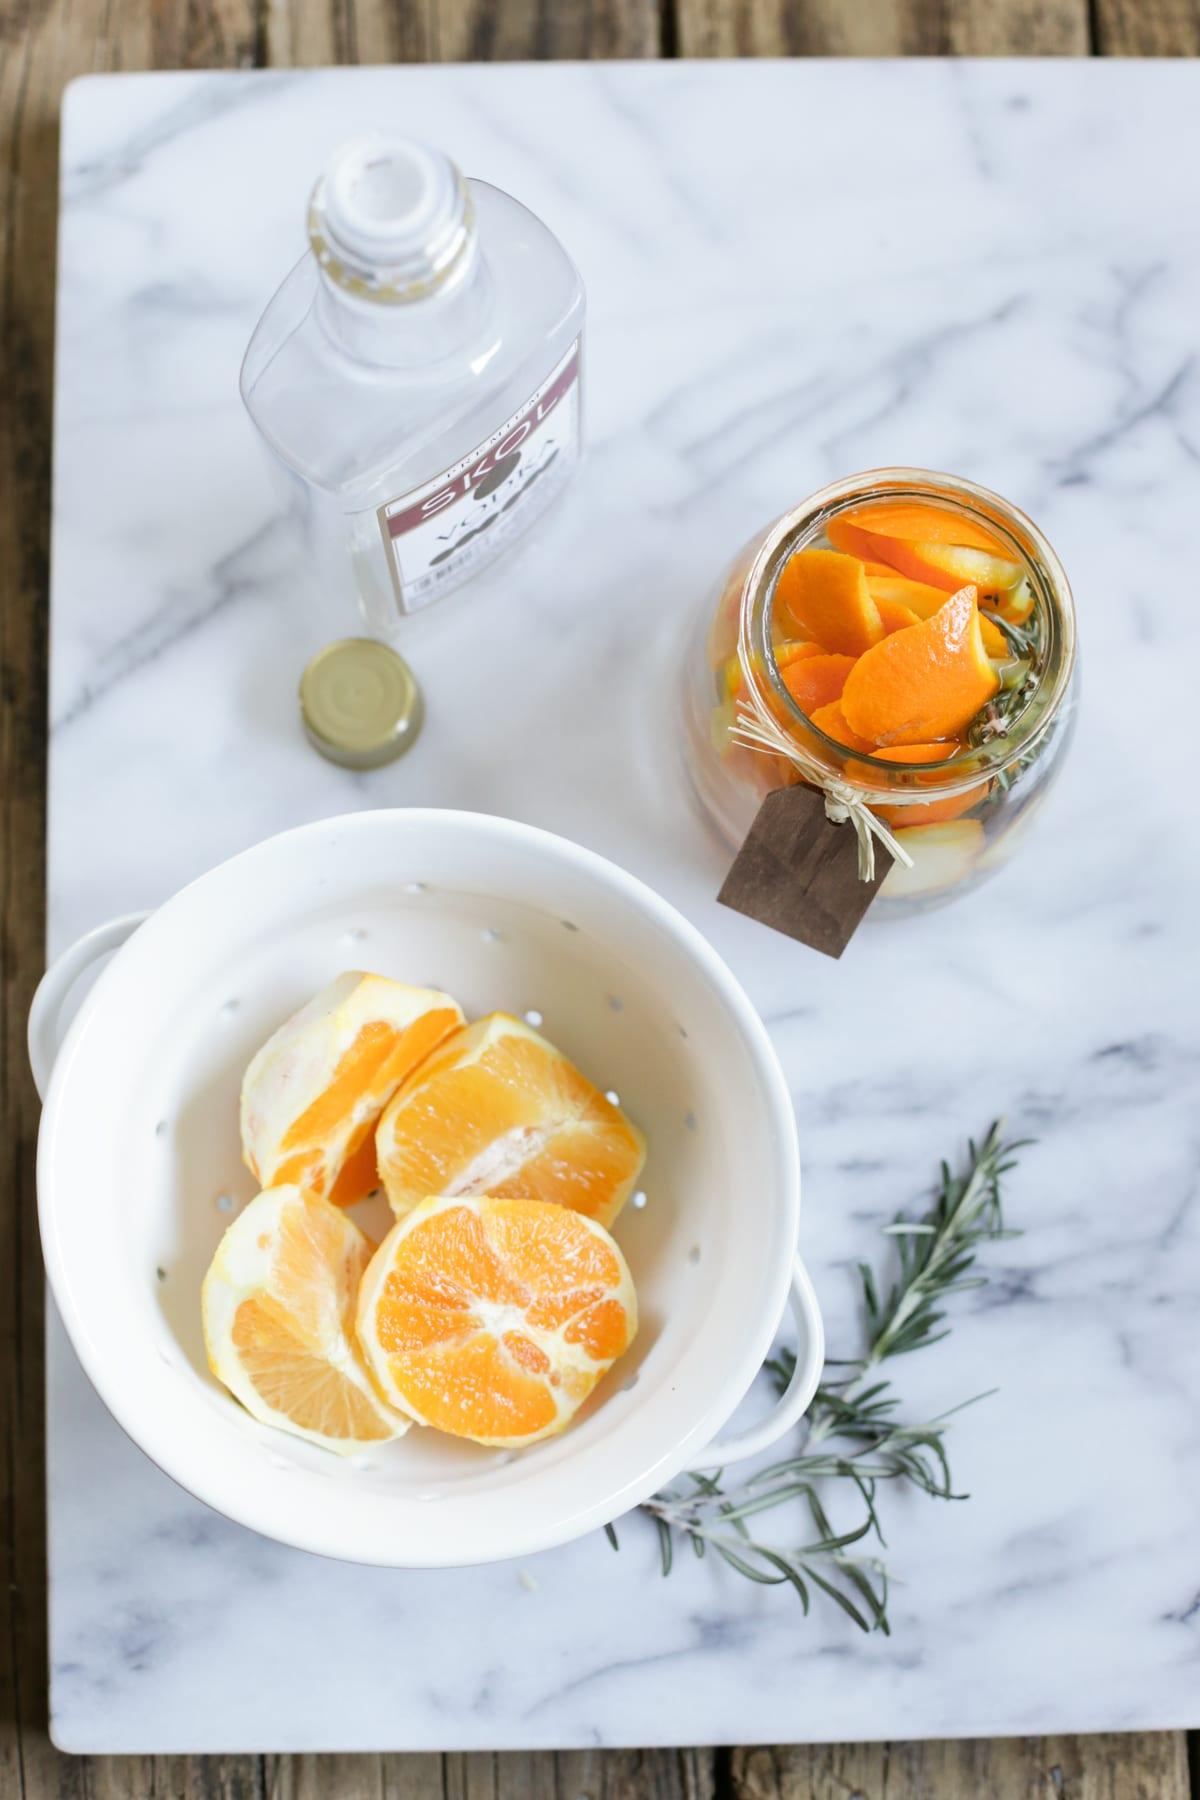 Air Freshener Ingredients Diy Citrus Air Freshener a